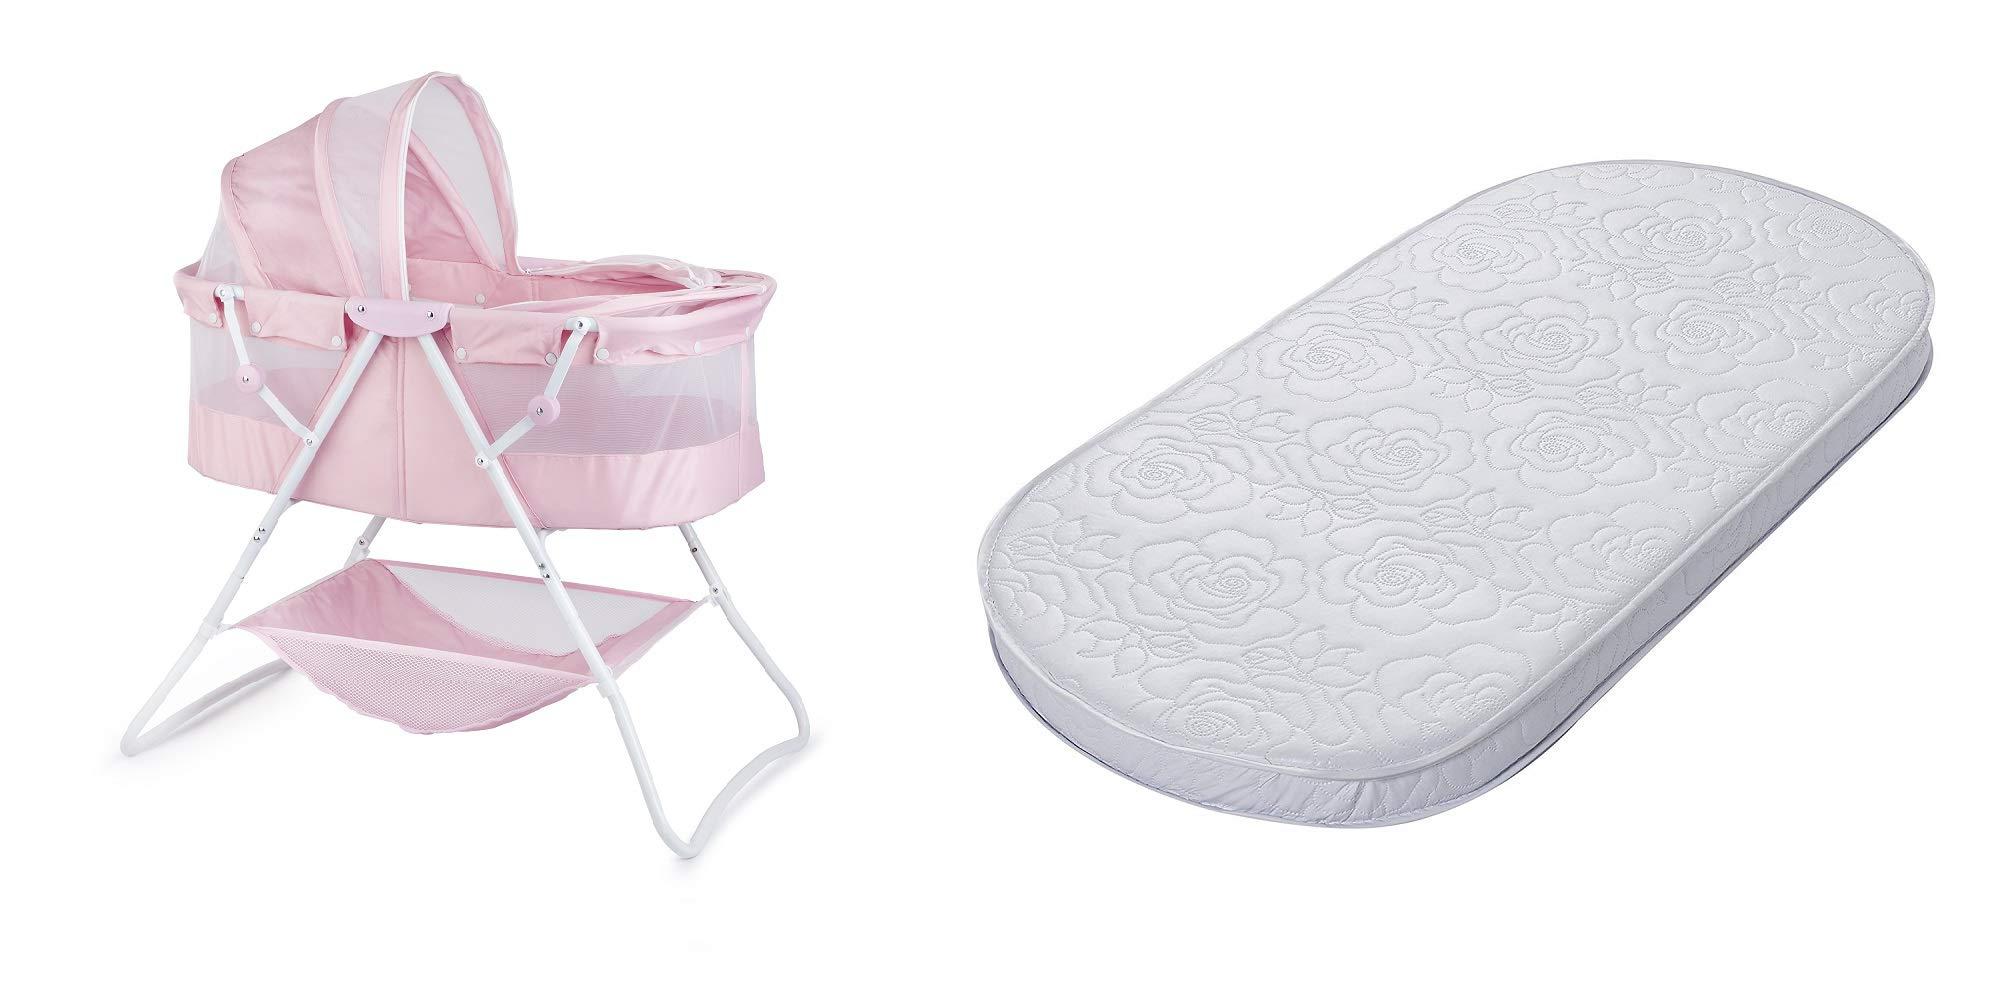 Big Oshi Waterproof Oval Bassinet Mattress and Portable Indoor/Outdoor Bassinet, Pink